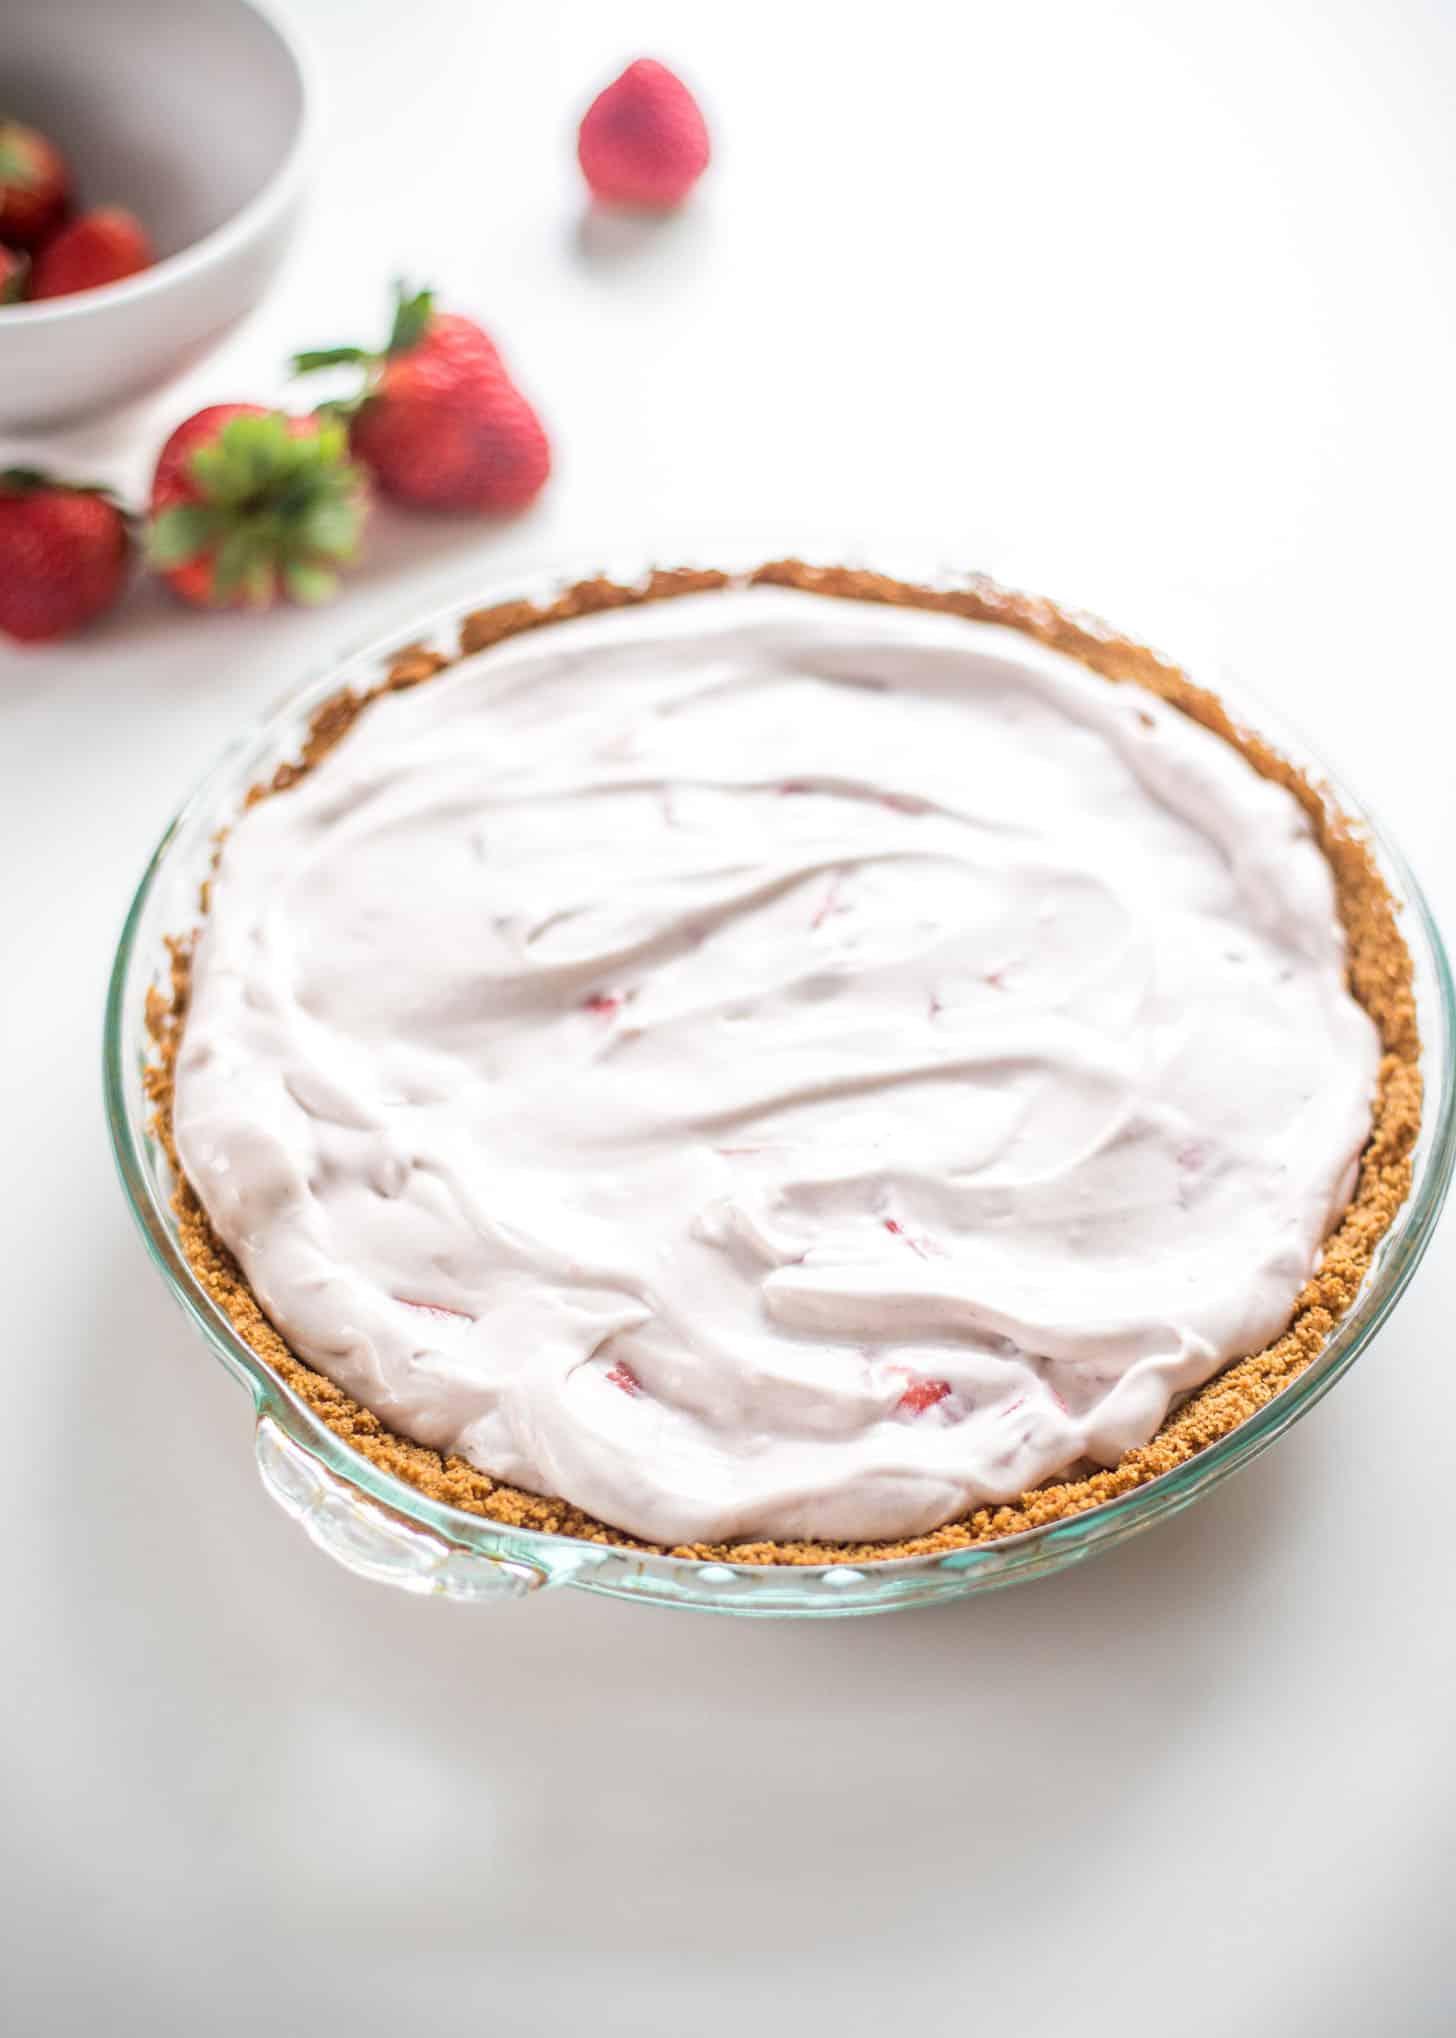 a strawberry cream pie in a clear pie dish